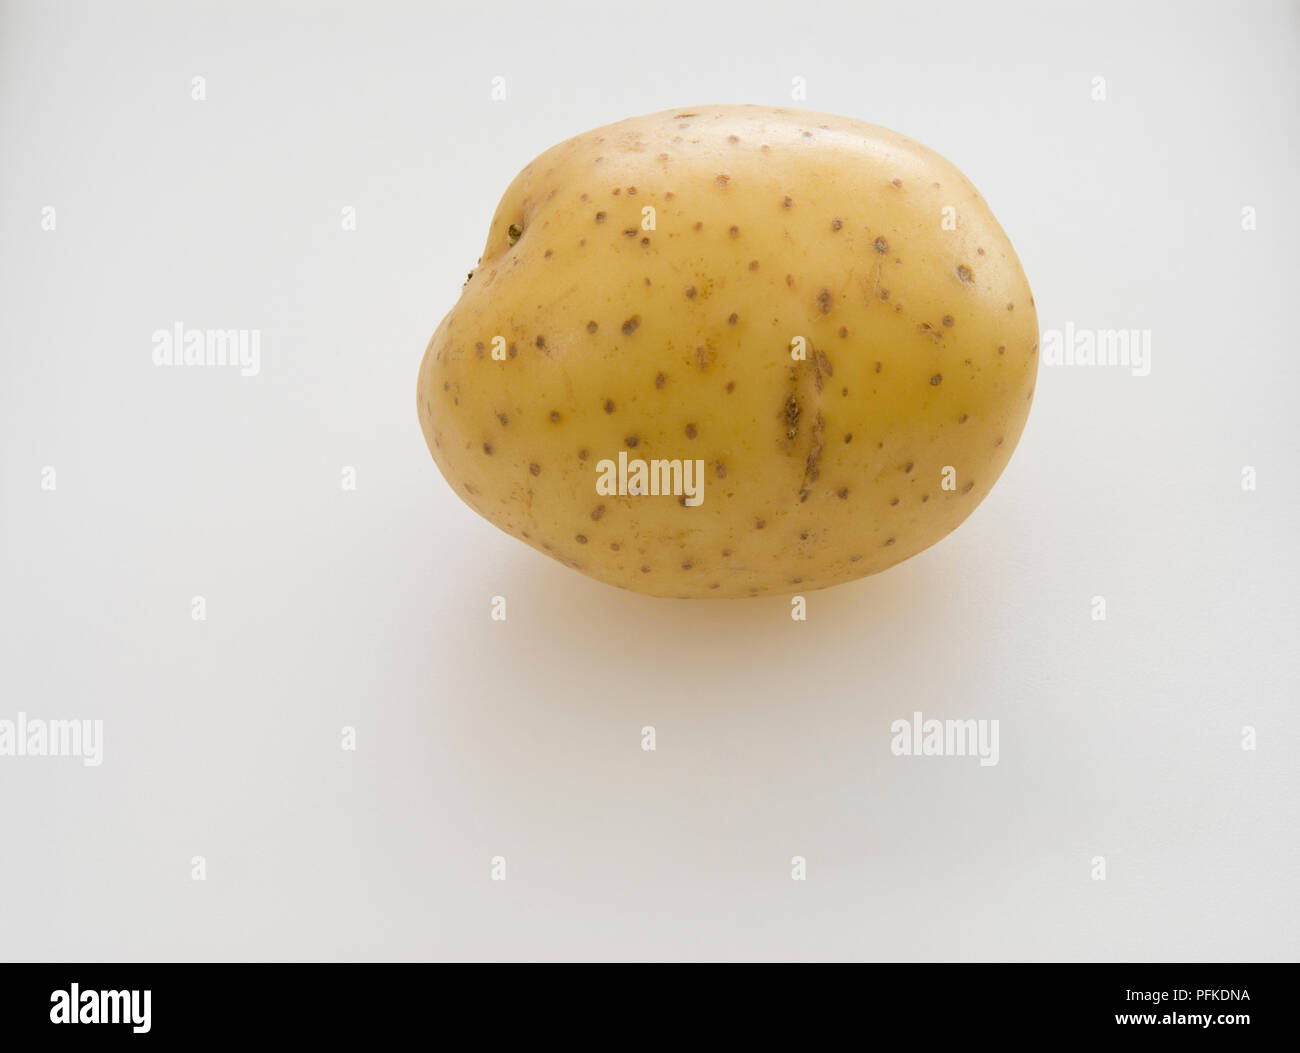 Potato 'Vivaldi', close-up - Stock Image